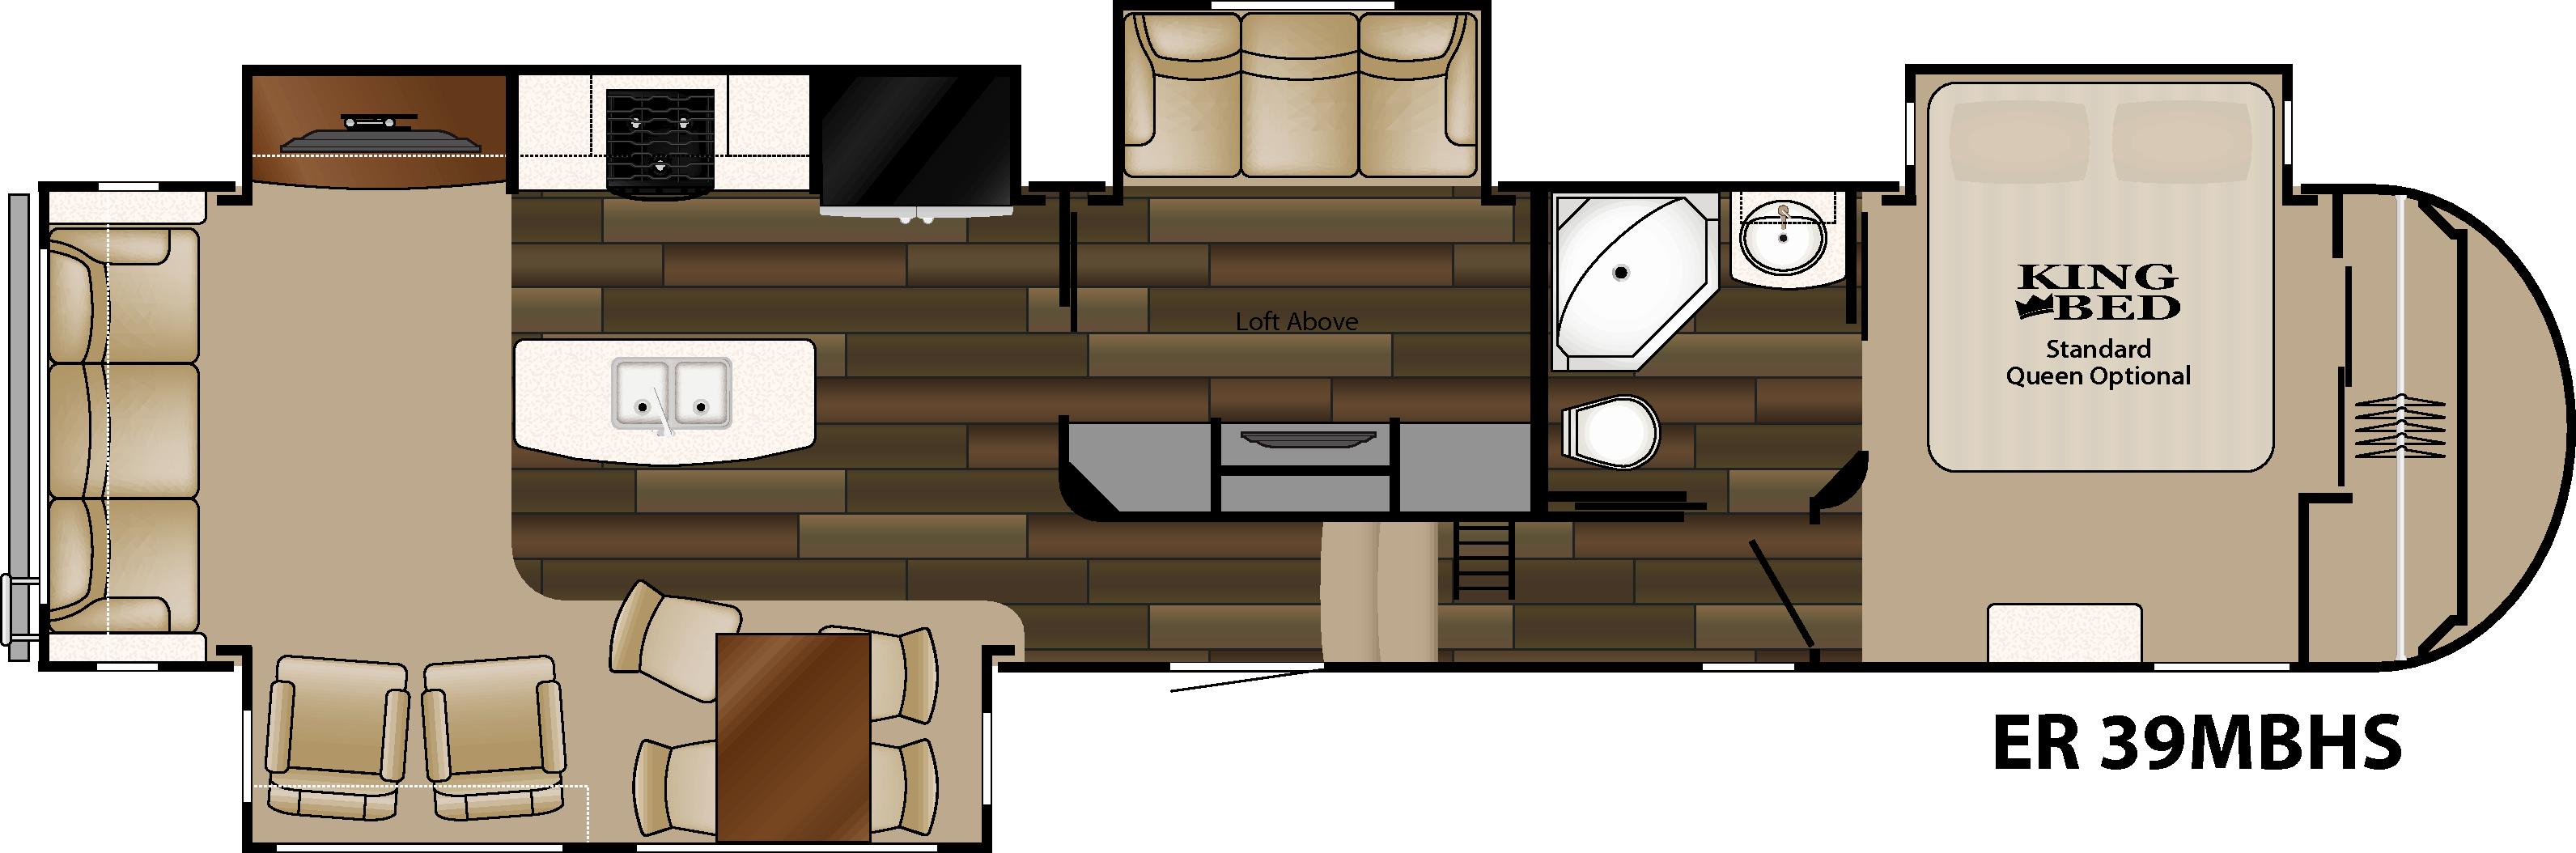 heartland elkridge 2015 er 39 mbhs has second tv room with loft